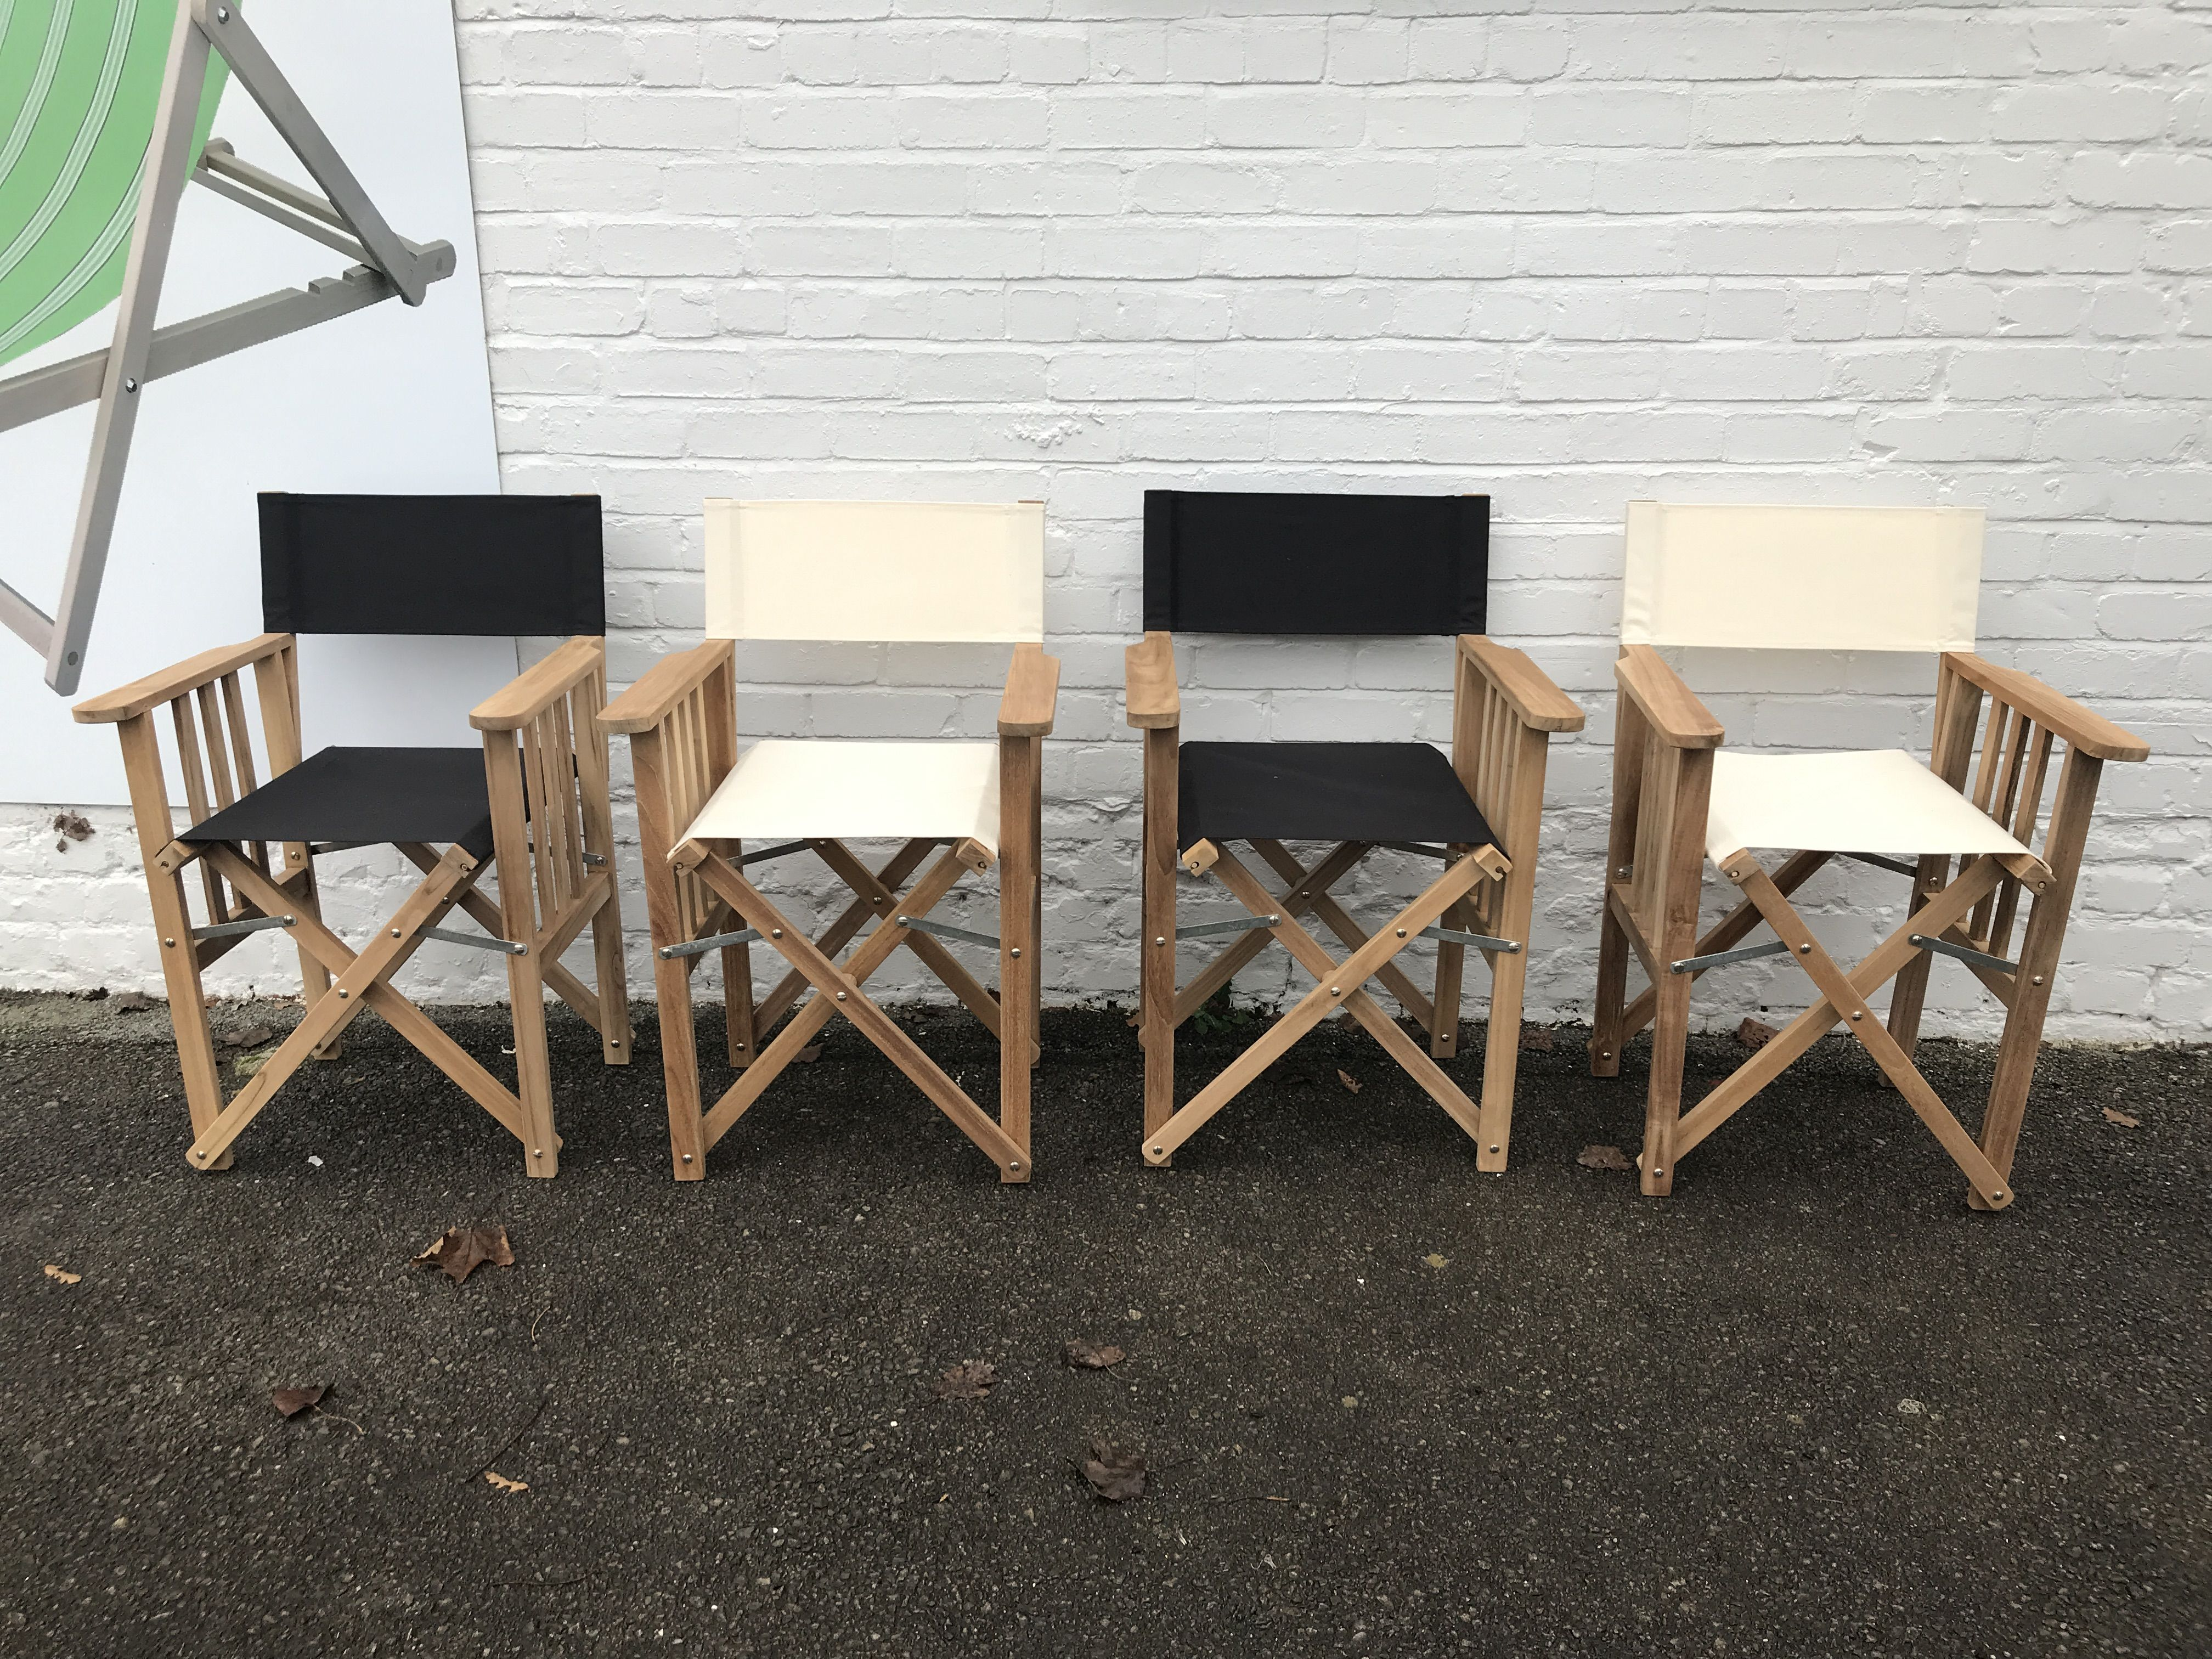 Black directors chair directors chair chair outdoor